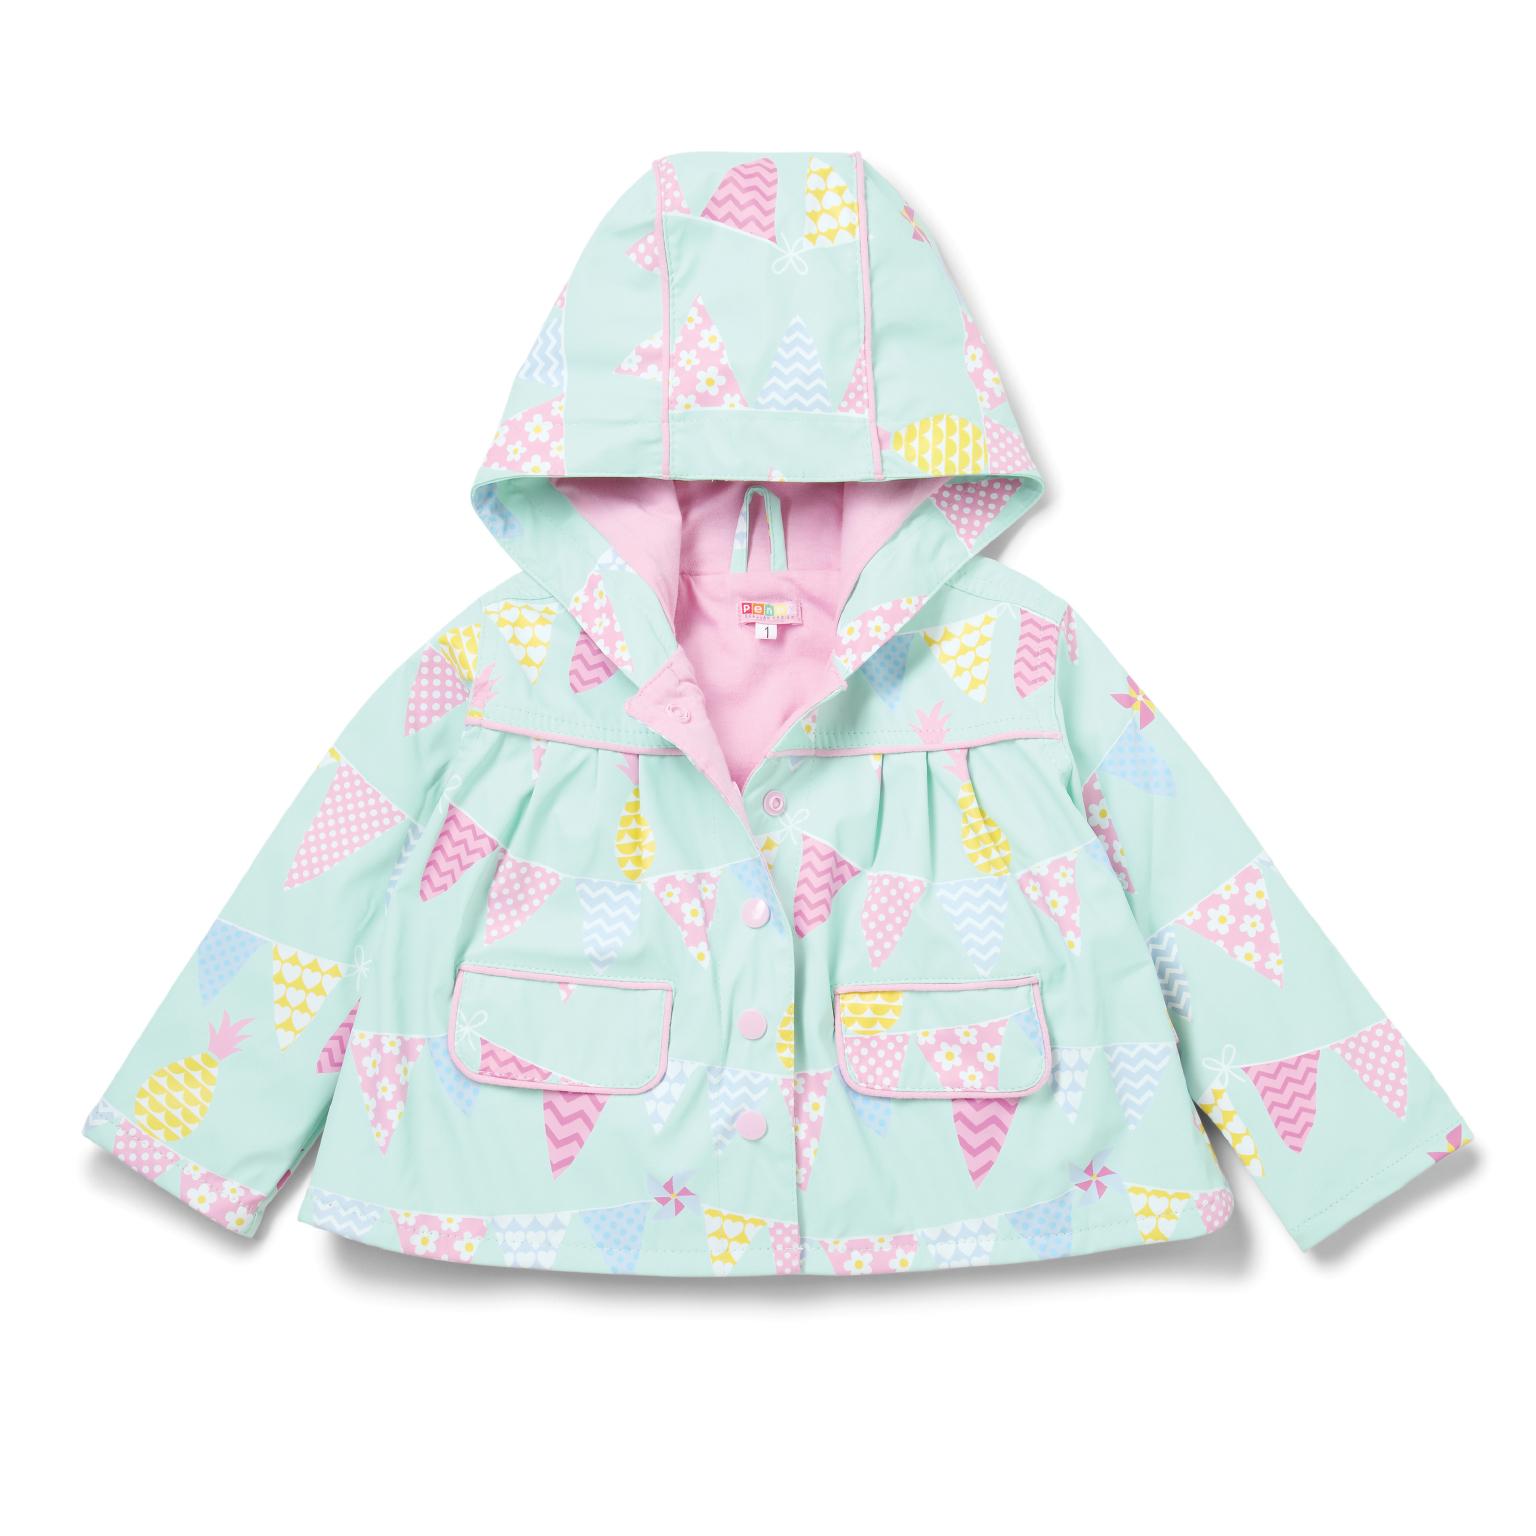 Raincoat Pineapple Bunting - Size 3-4 image